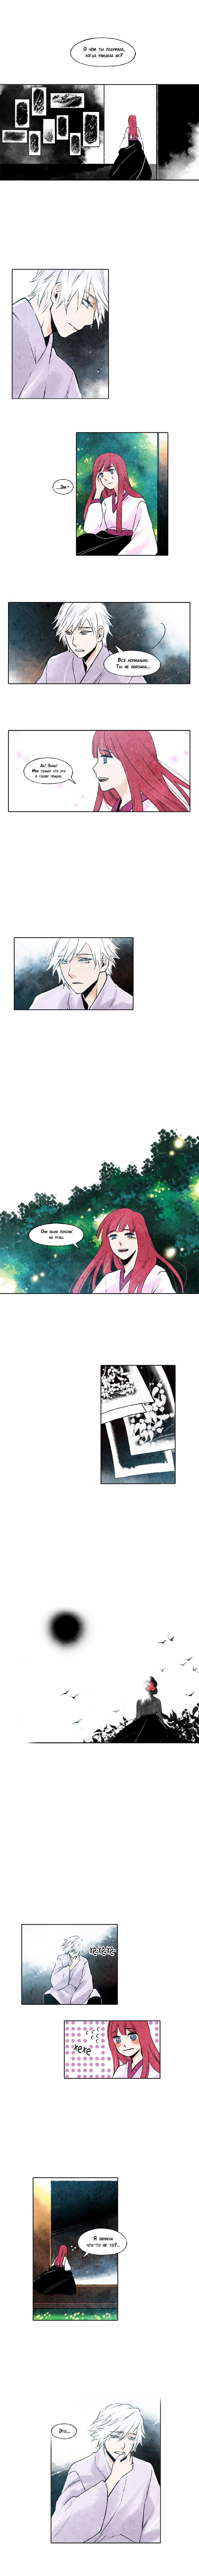 https://r1.ninemanga.com/comics/pic2/39/22503/416383/1532884387102.jpg Page 4